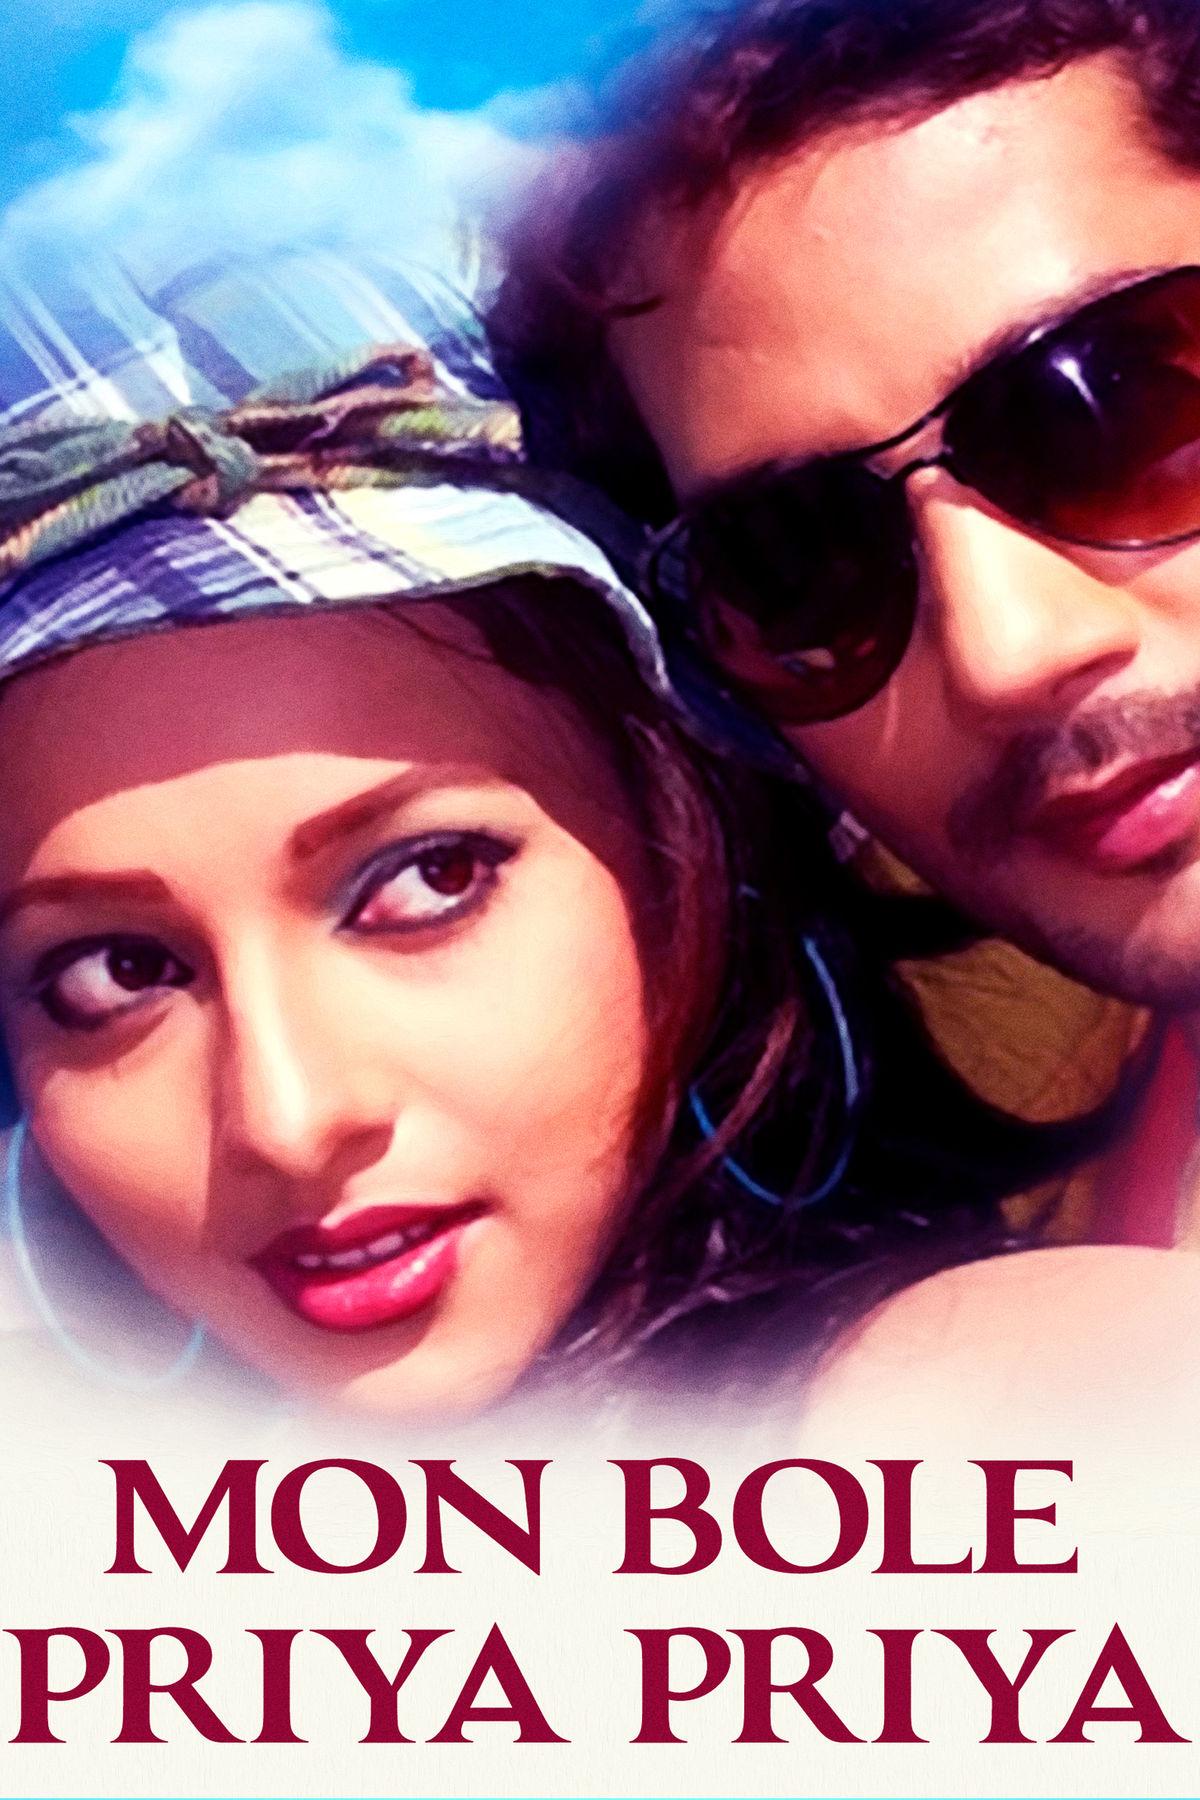 Mon Bole Priya Priya